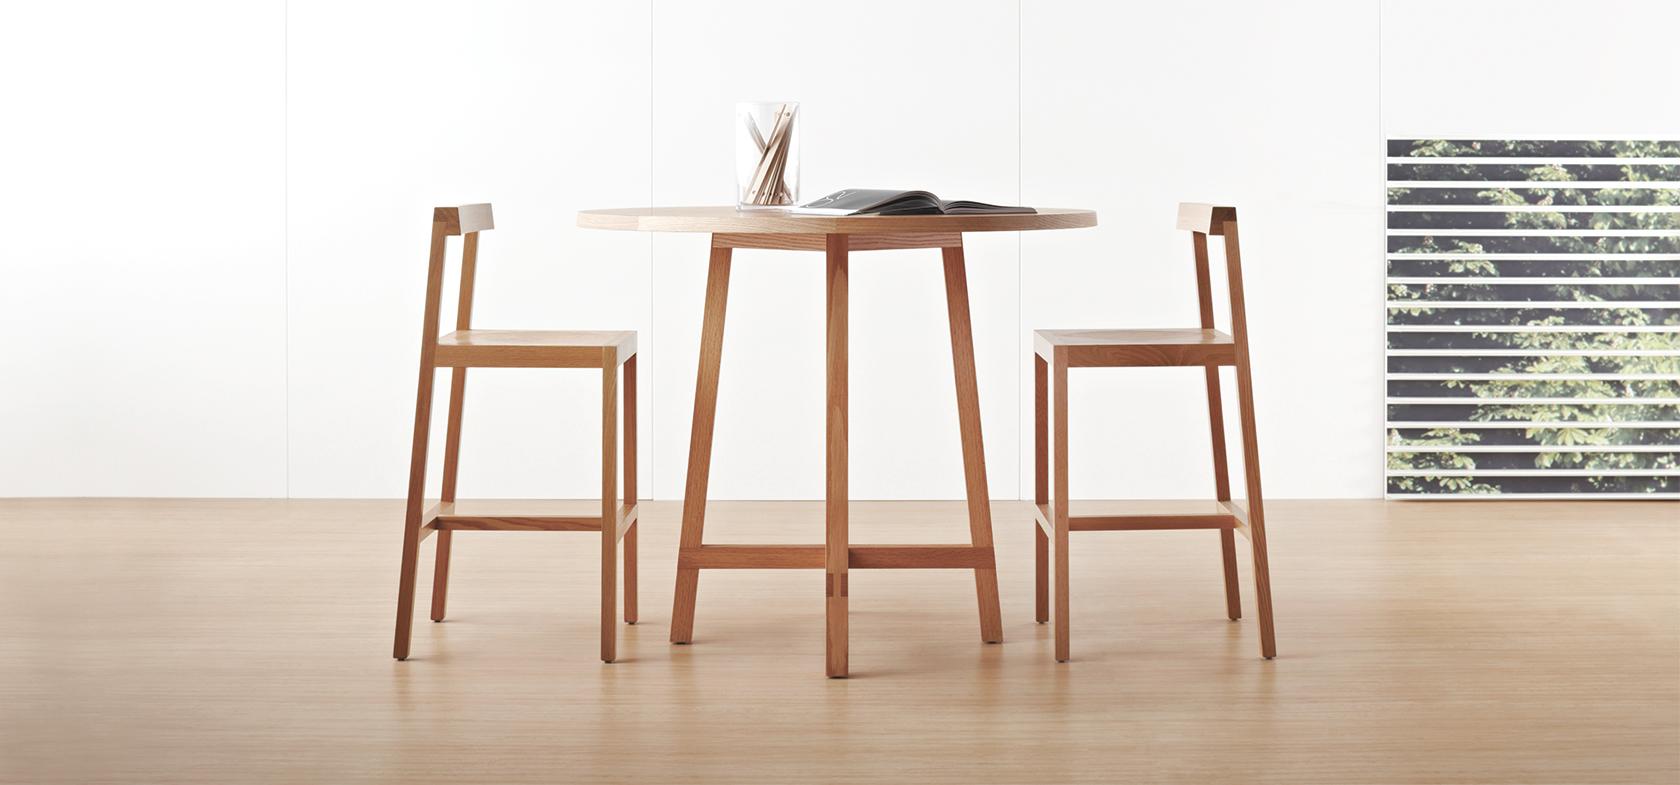 toro-table